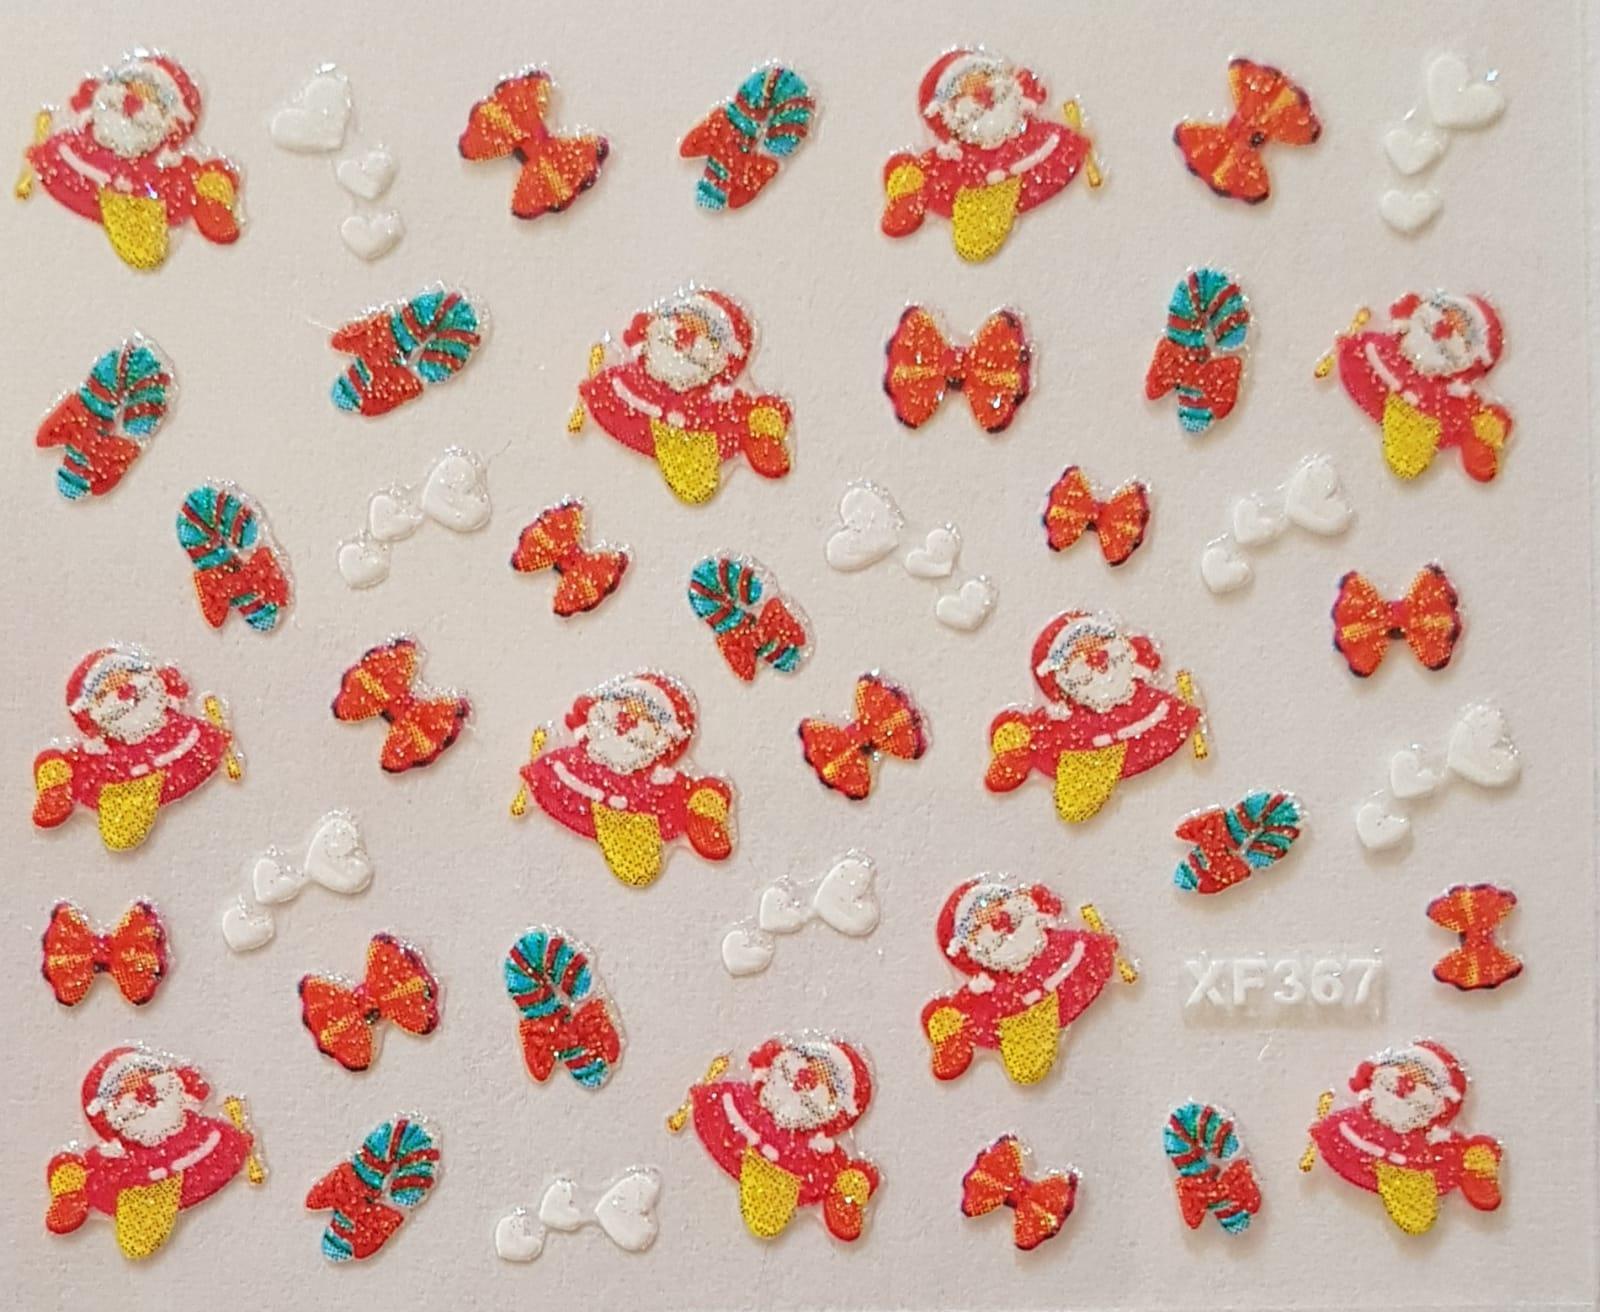 Stickers navideños xf-367